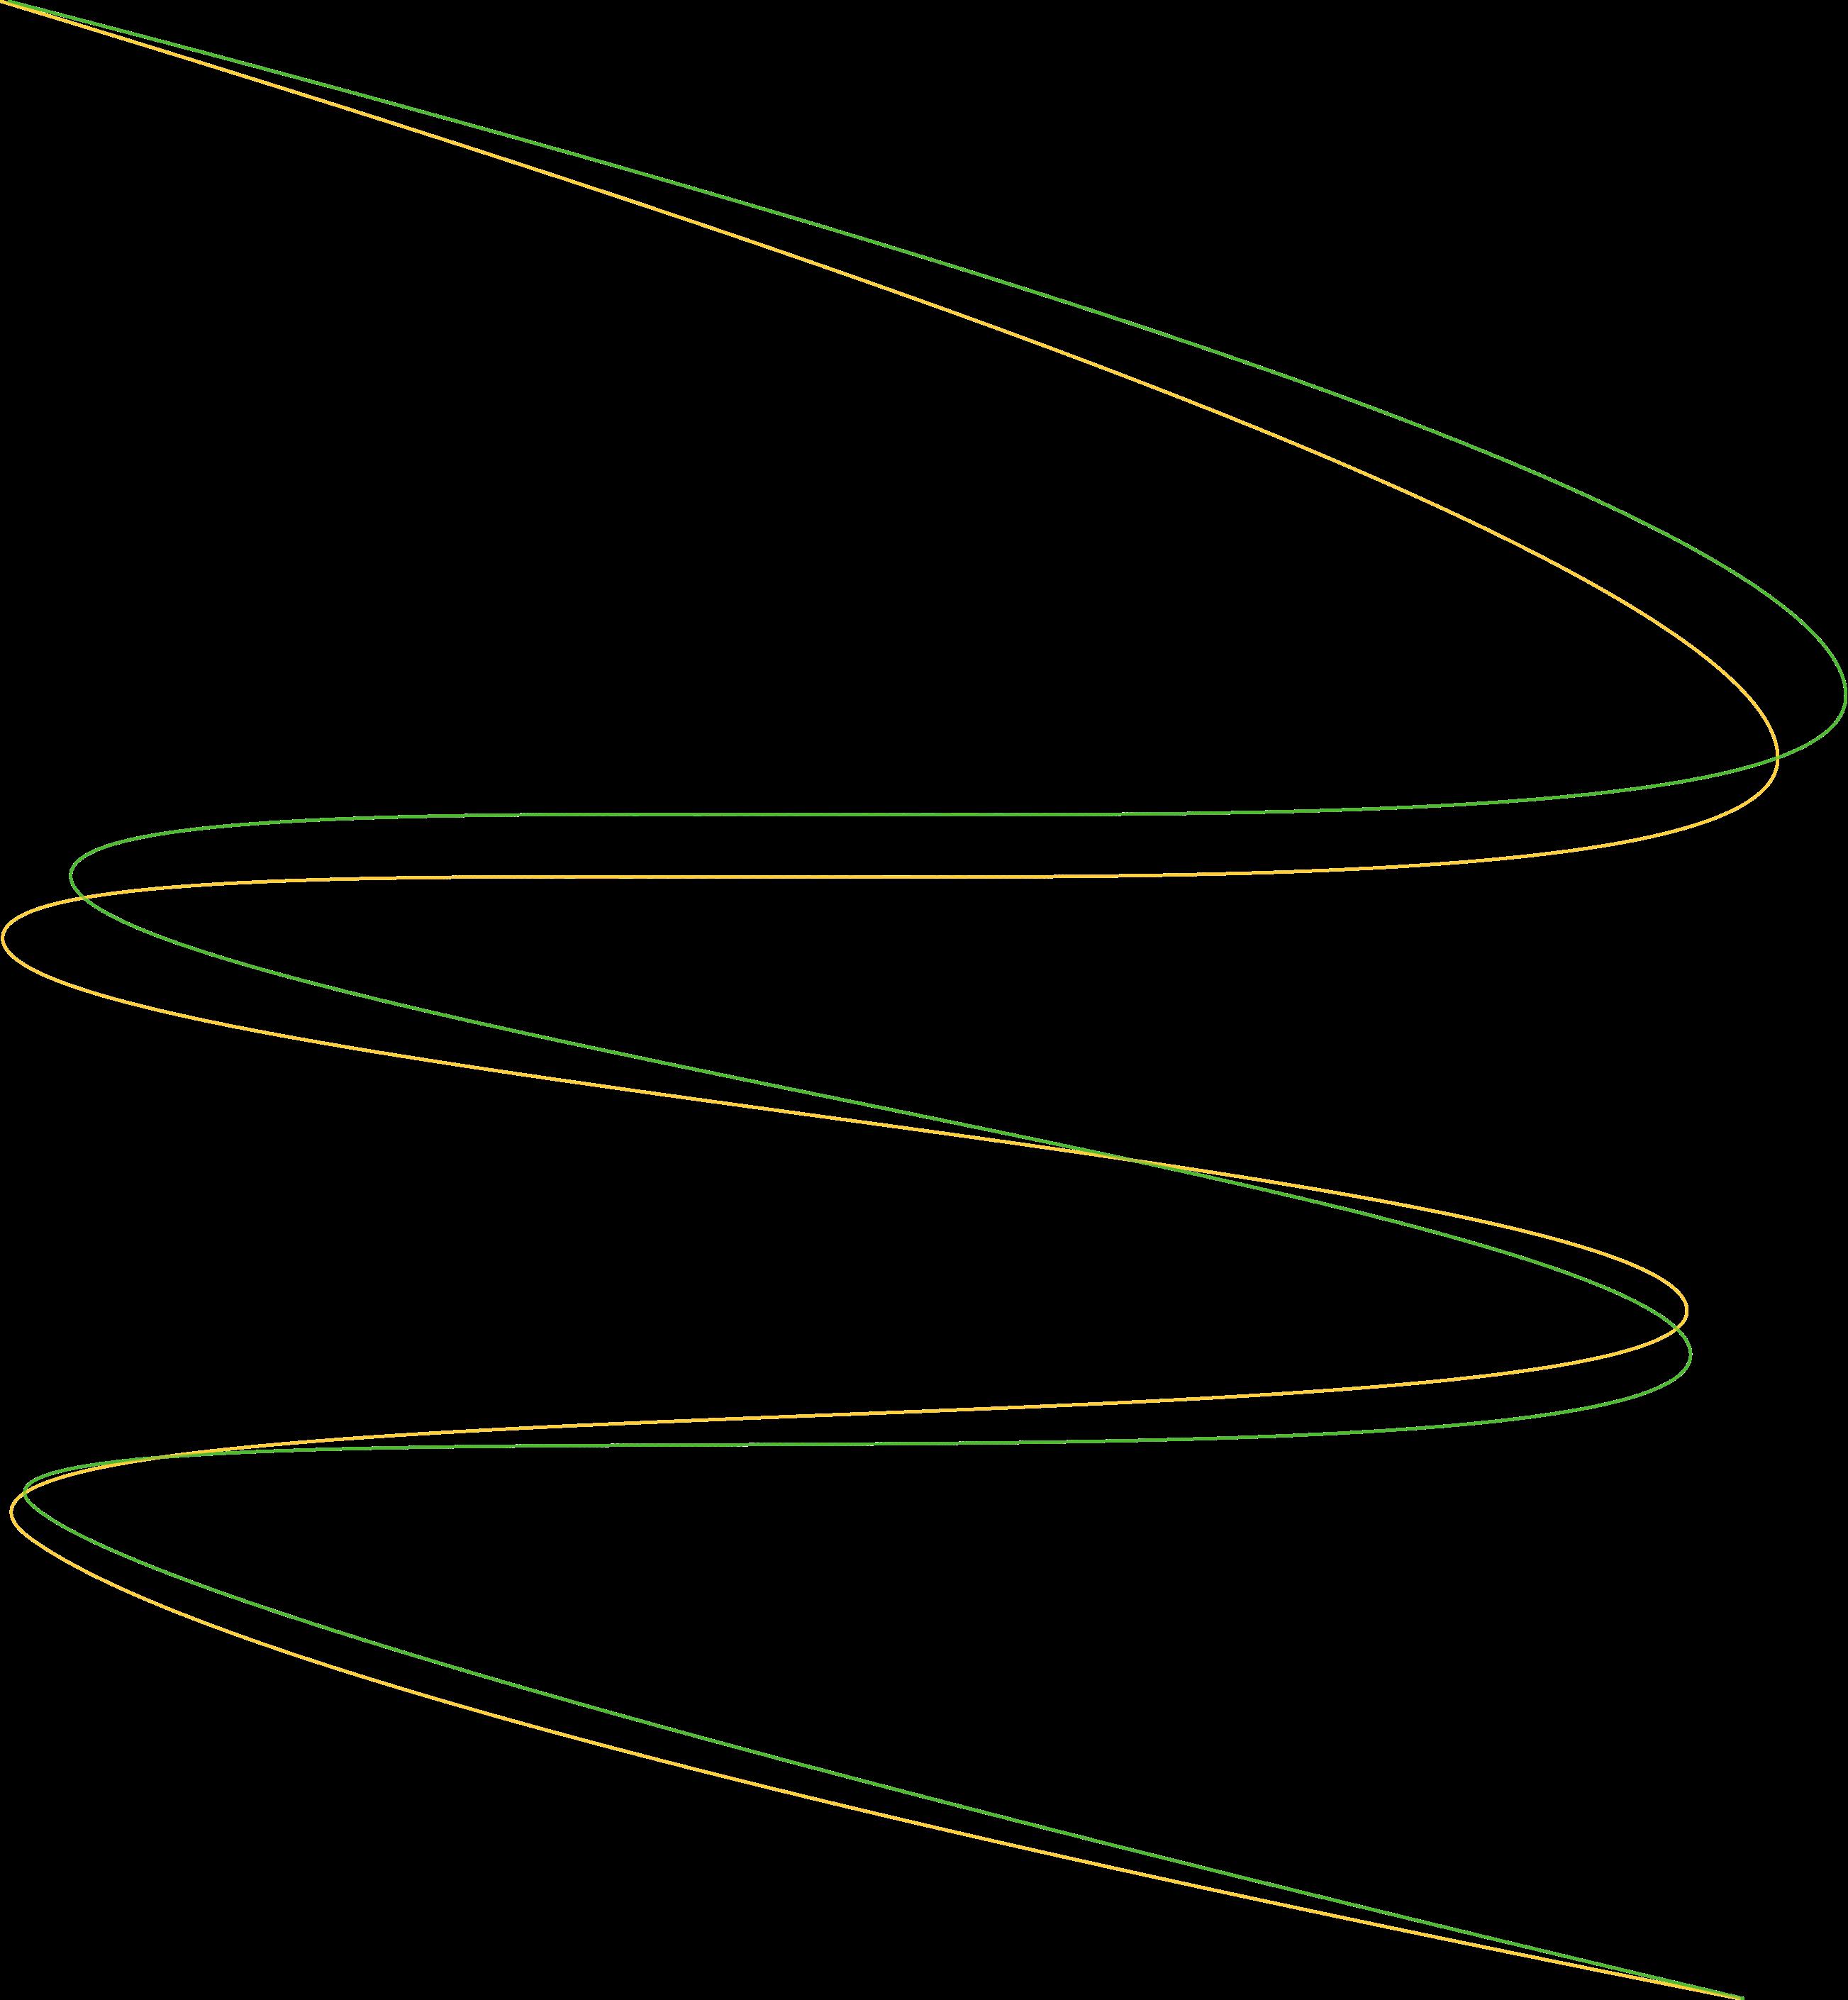 line-background